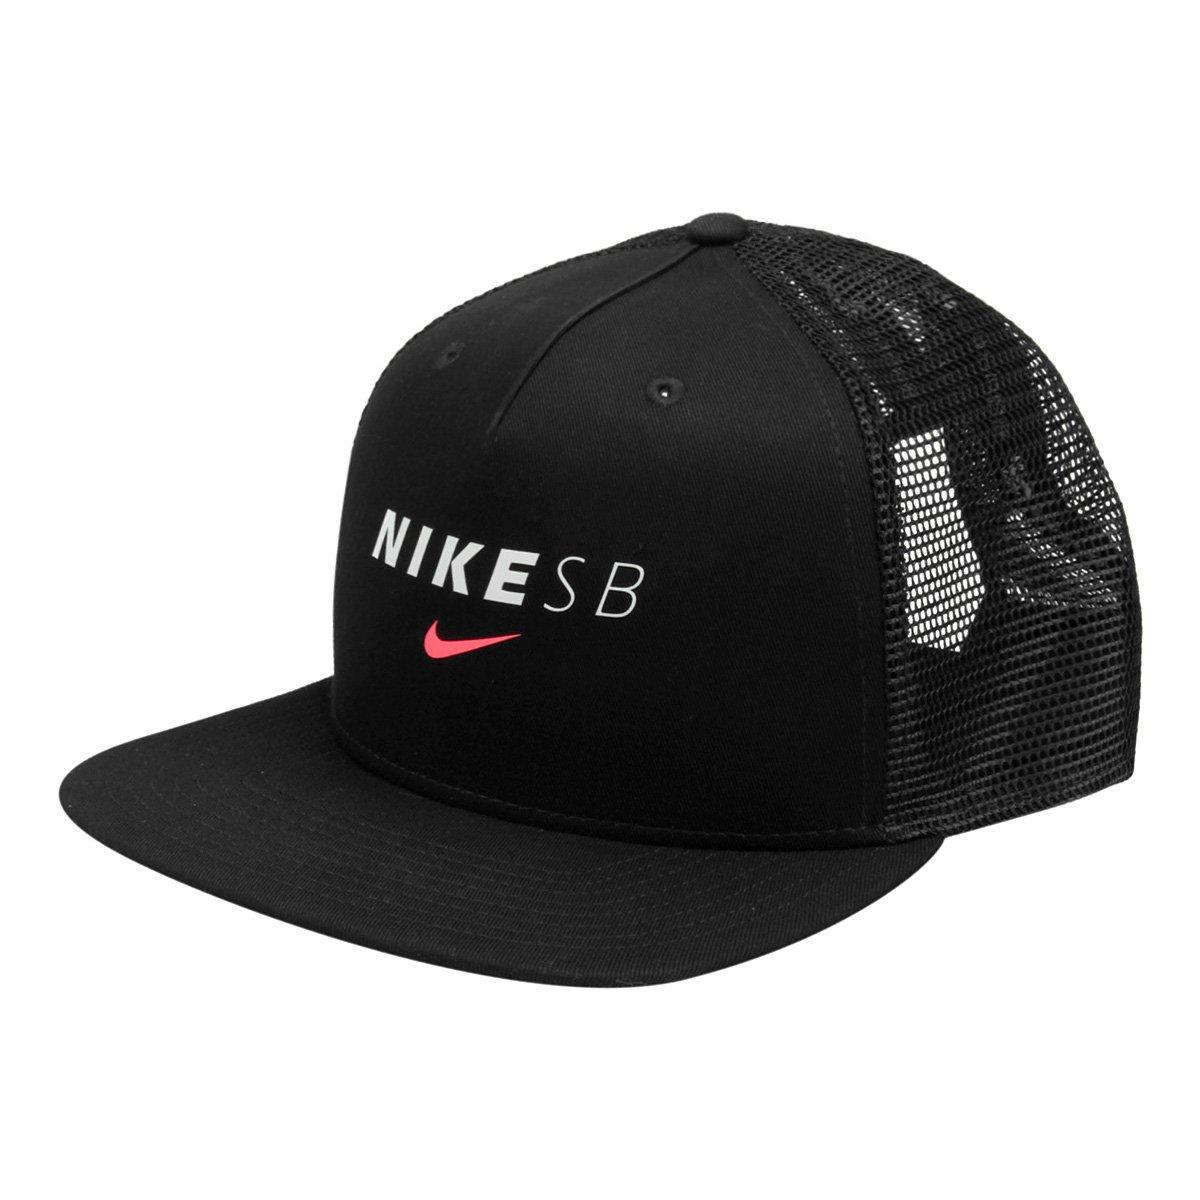 Boné Nike Aba Reta U Pro Scrn Prt Trucker - Compre Agora  8c51ba5f60032